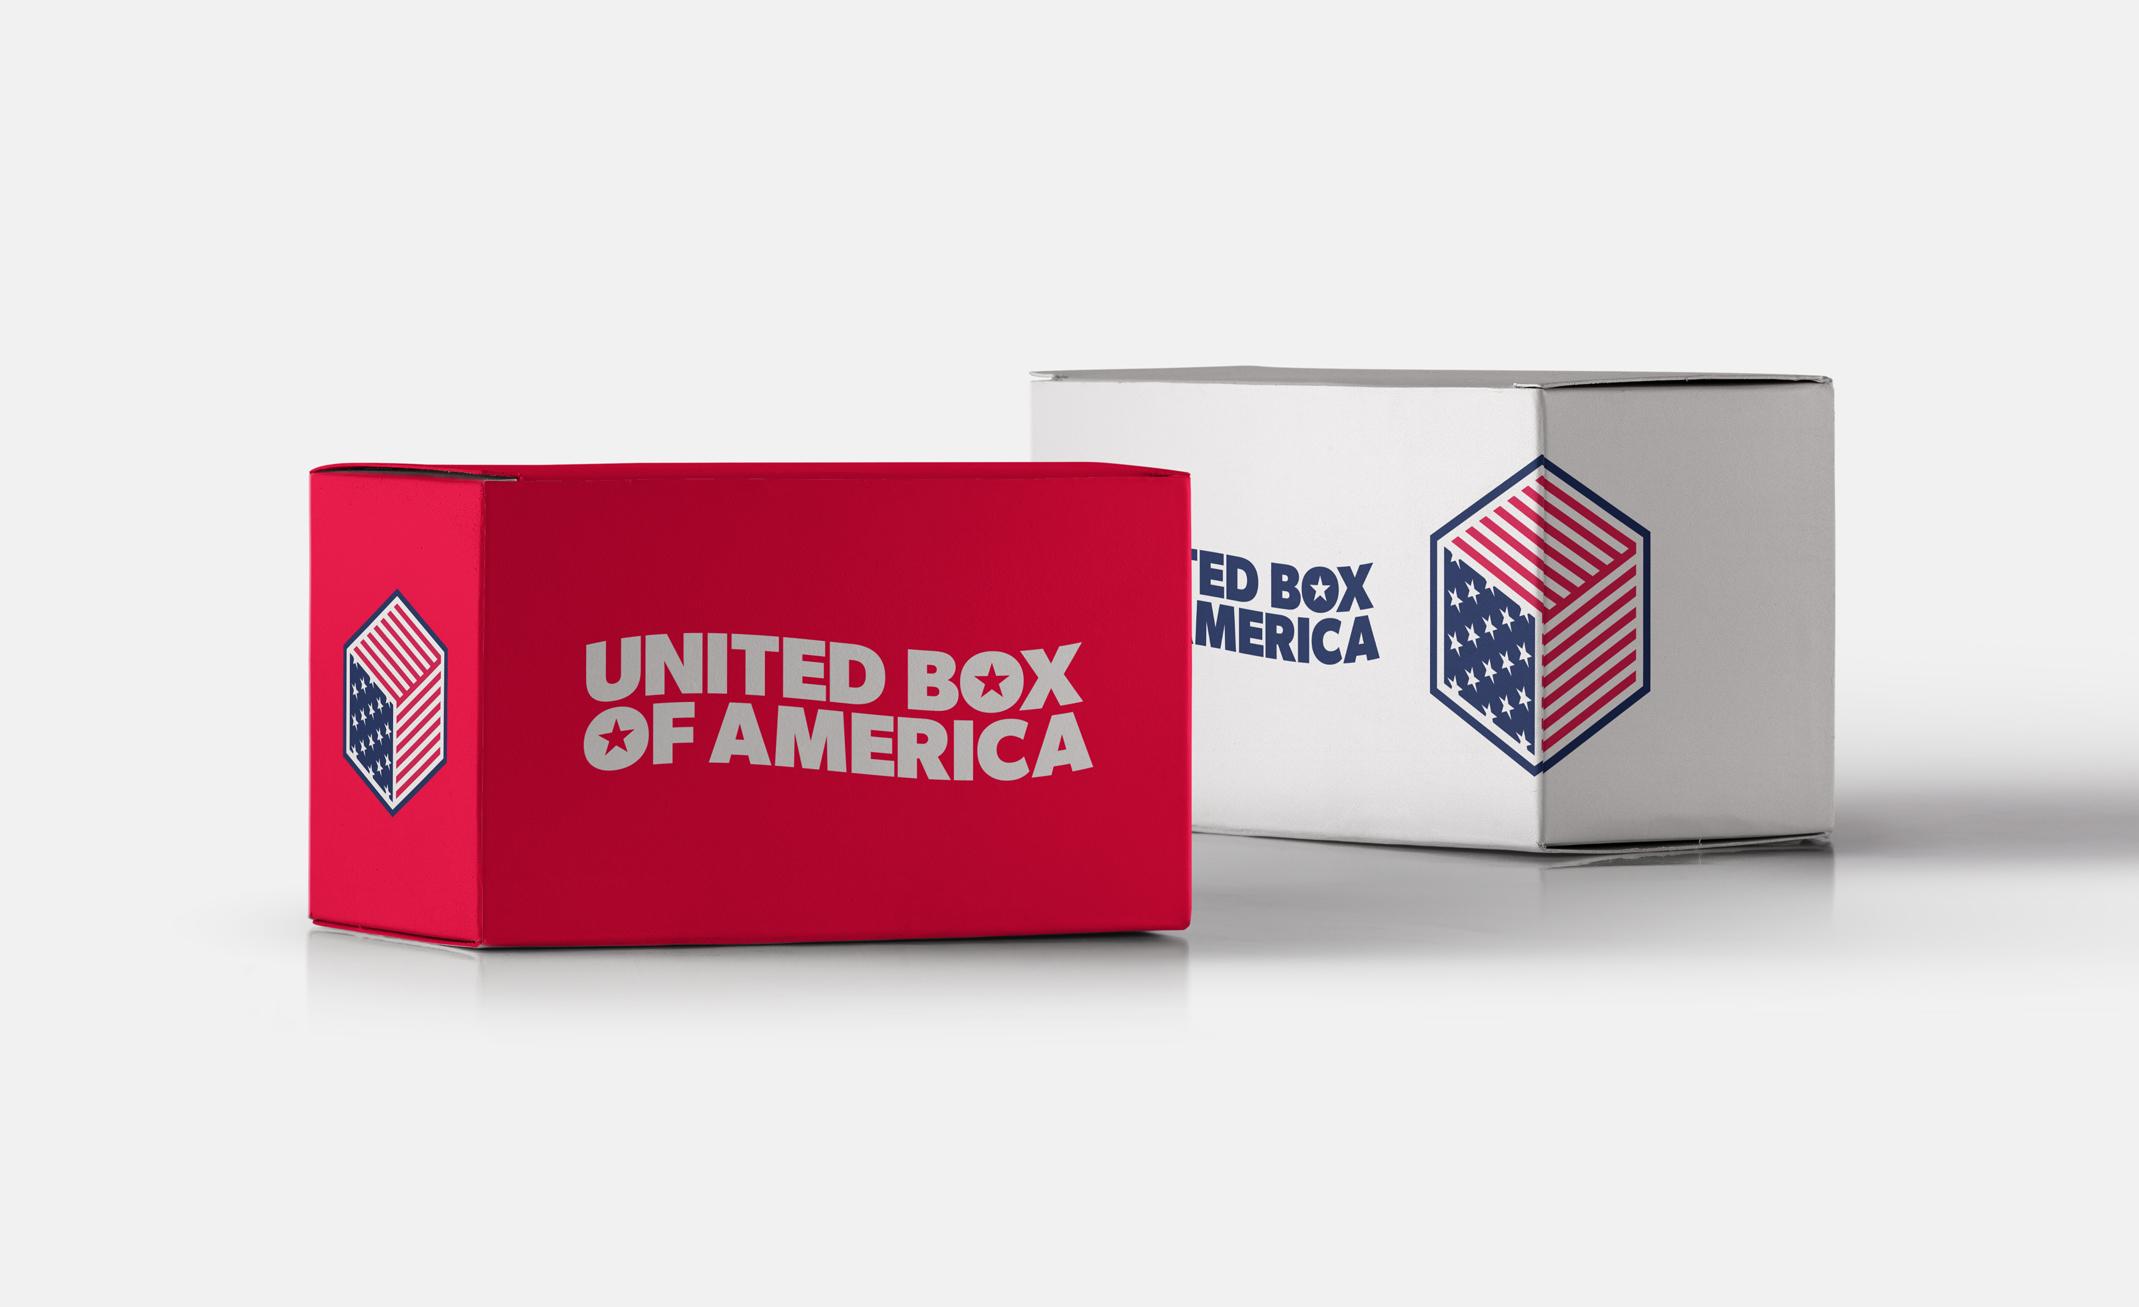 United Box of America